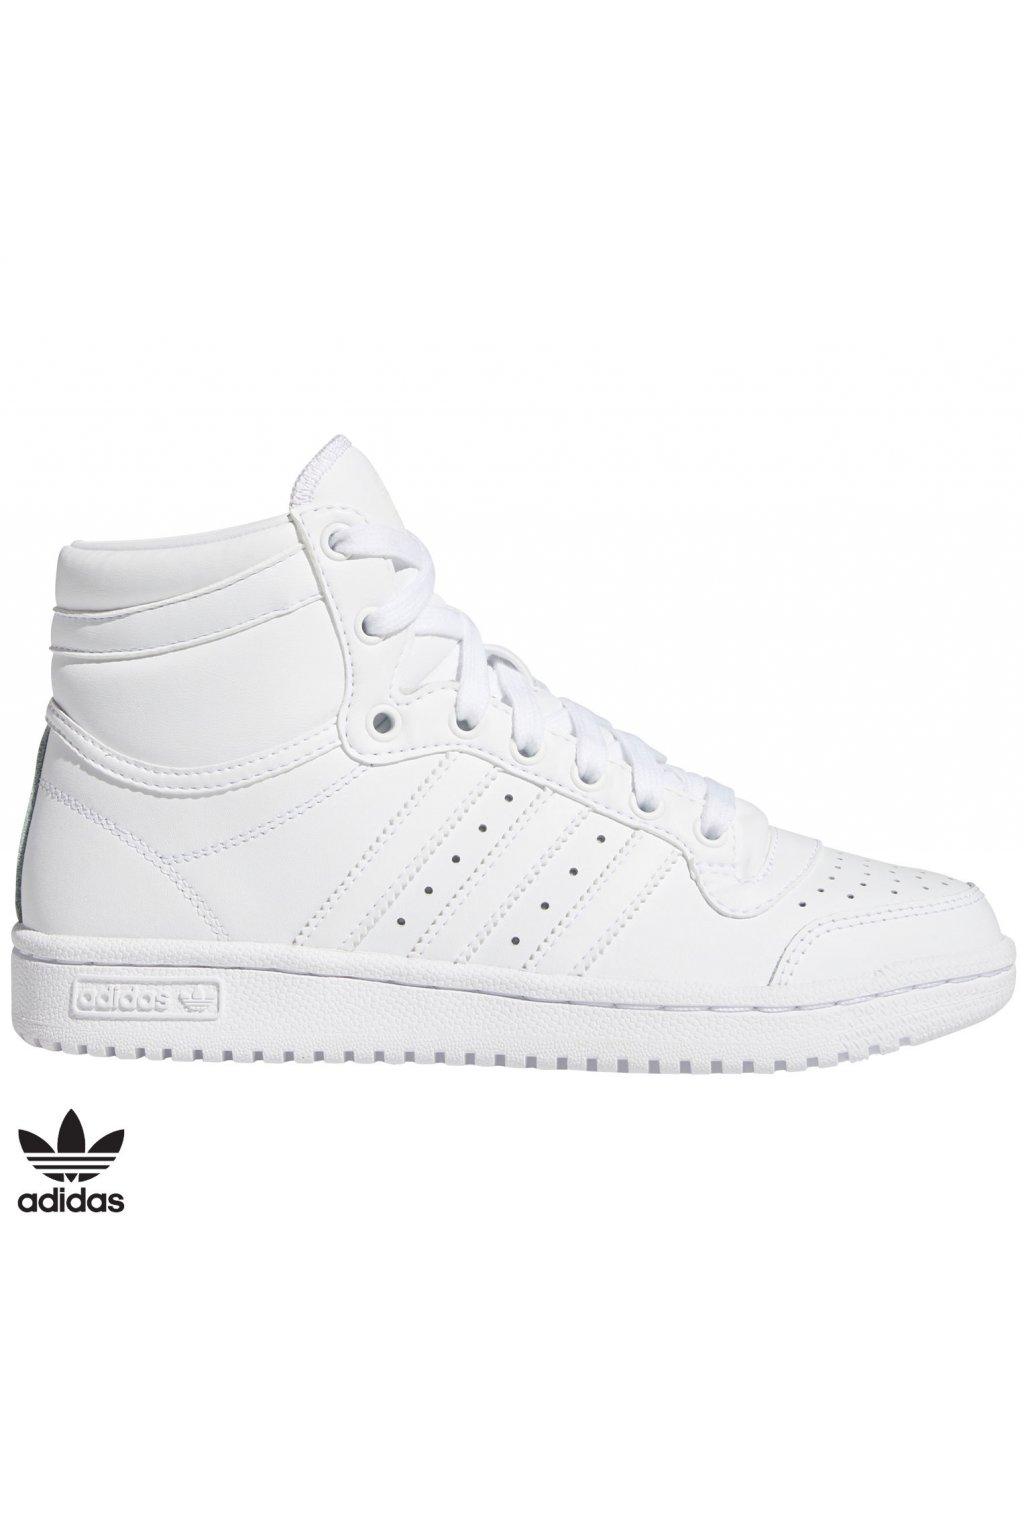 fw4997 vysoke biele tenisky adidas top ten j